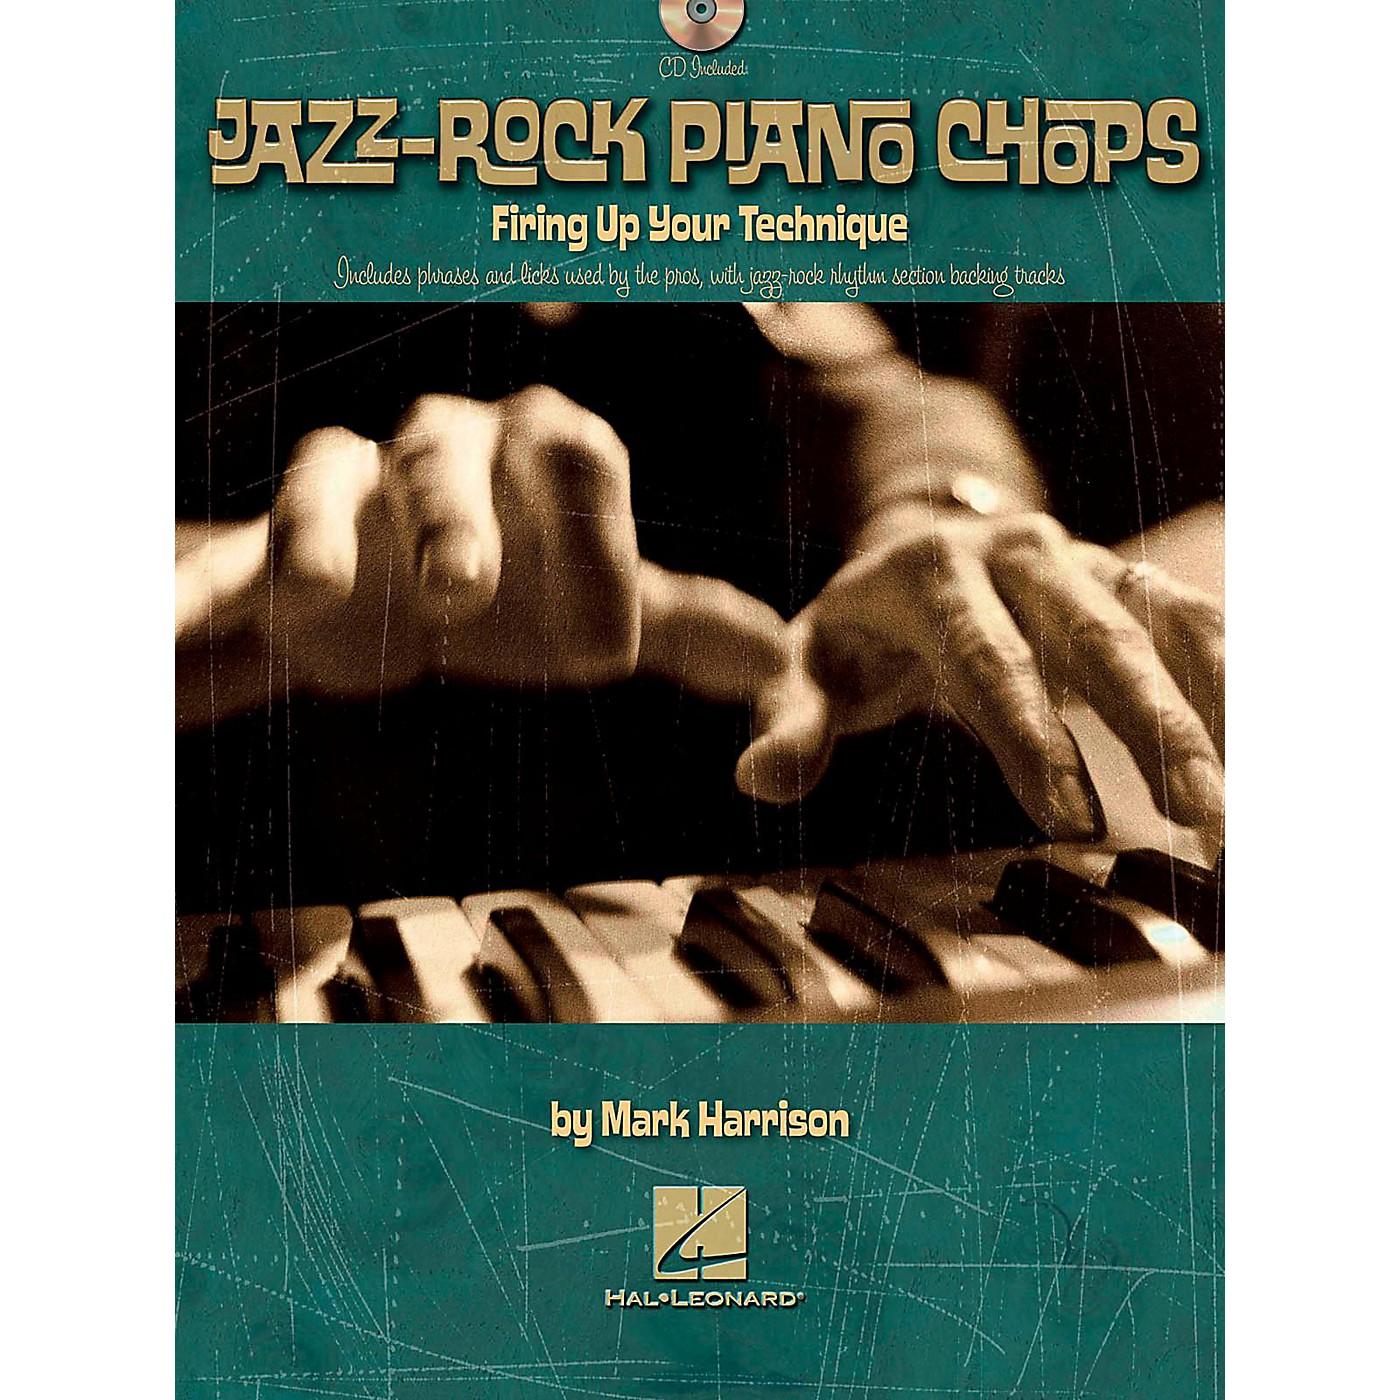 Hal Leonard Jazz-Rock Piano Chops - Firing Up Your Technique Book/CD thumbnail